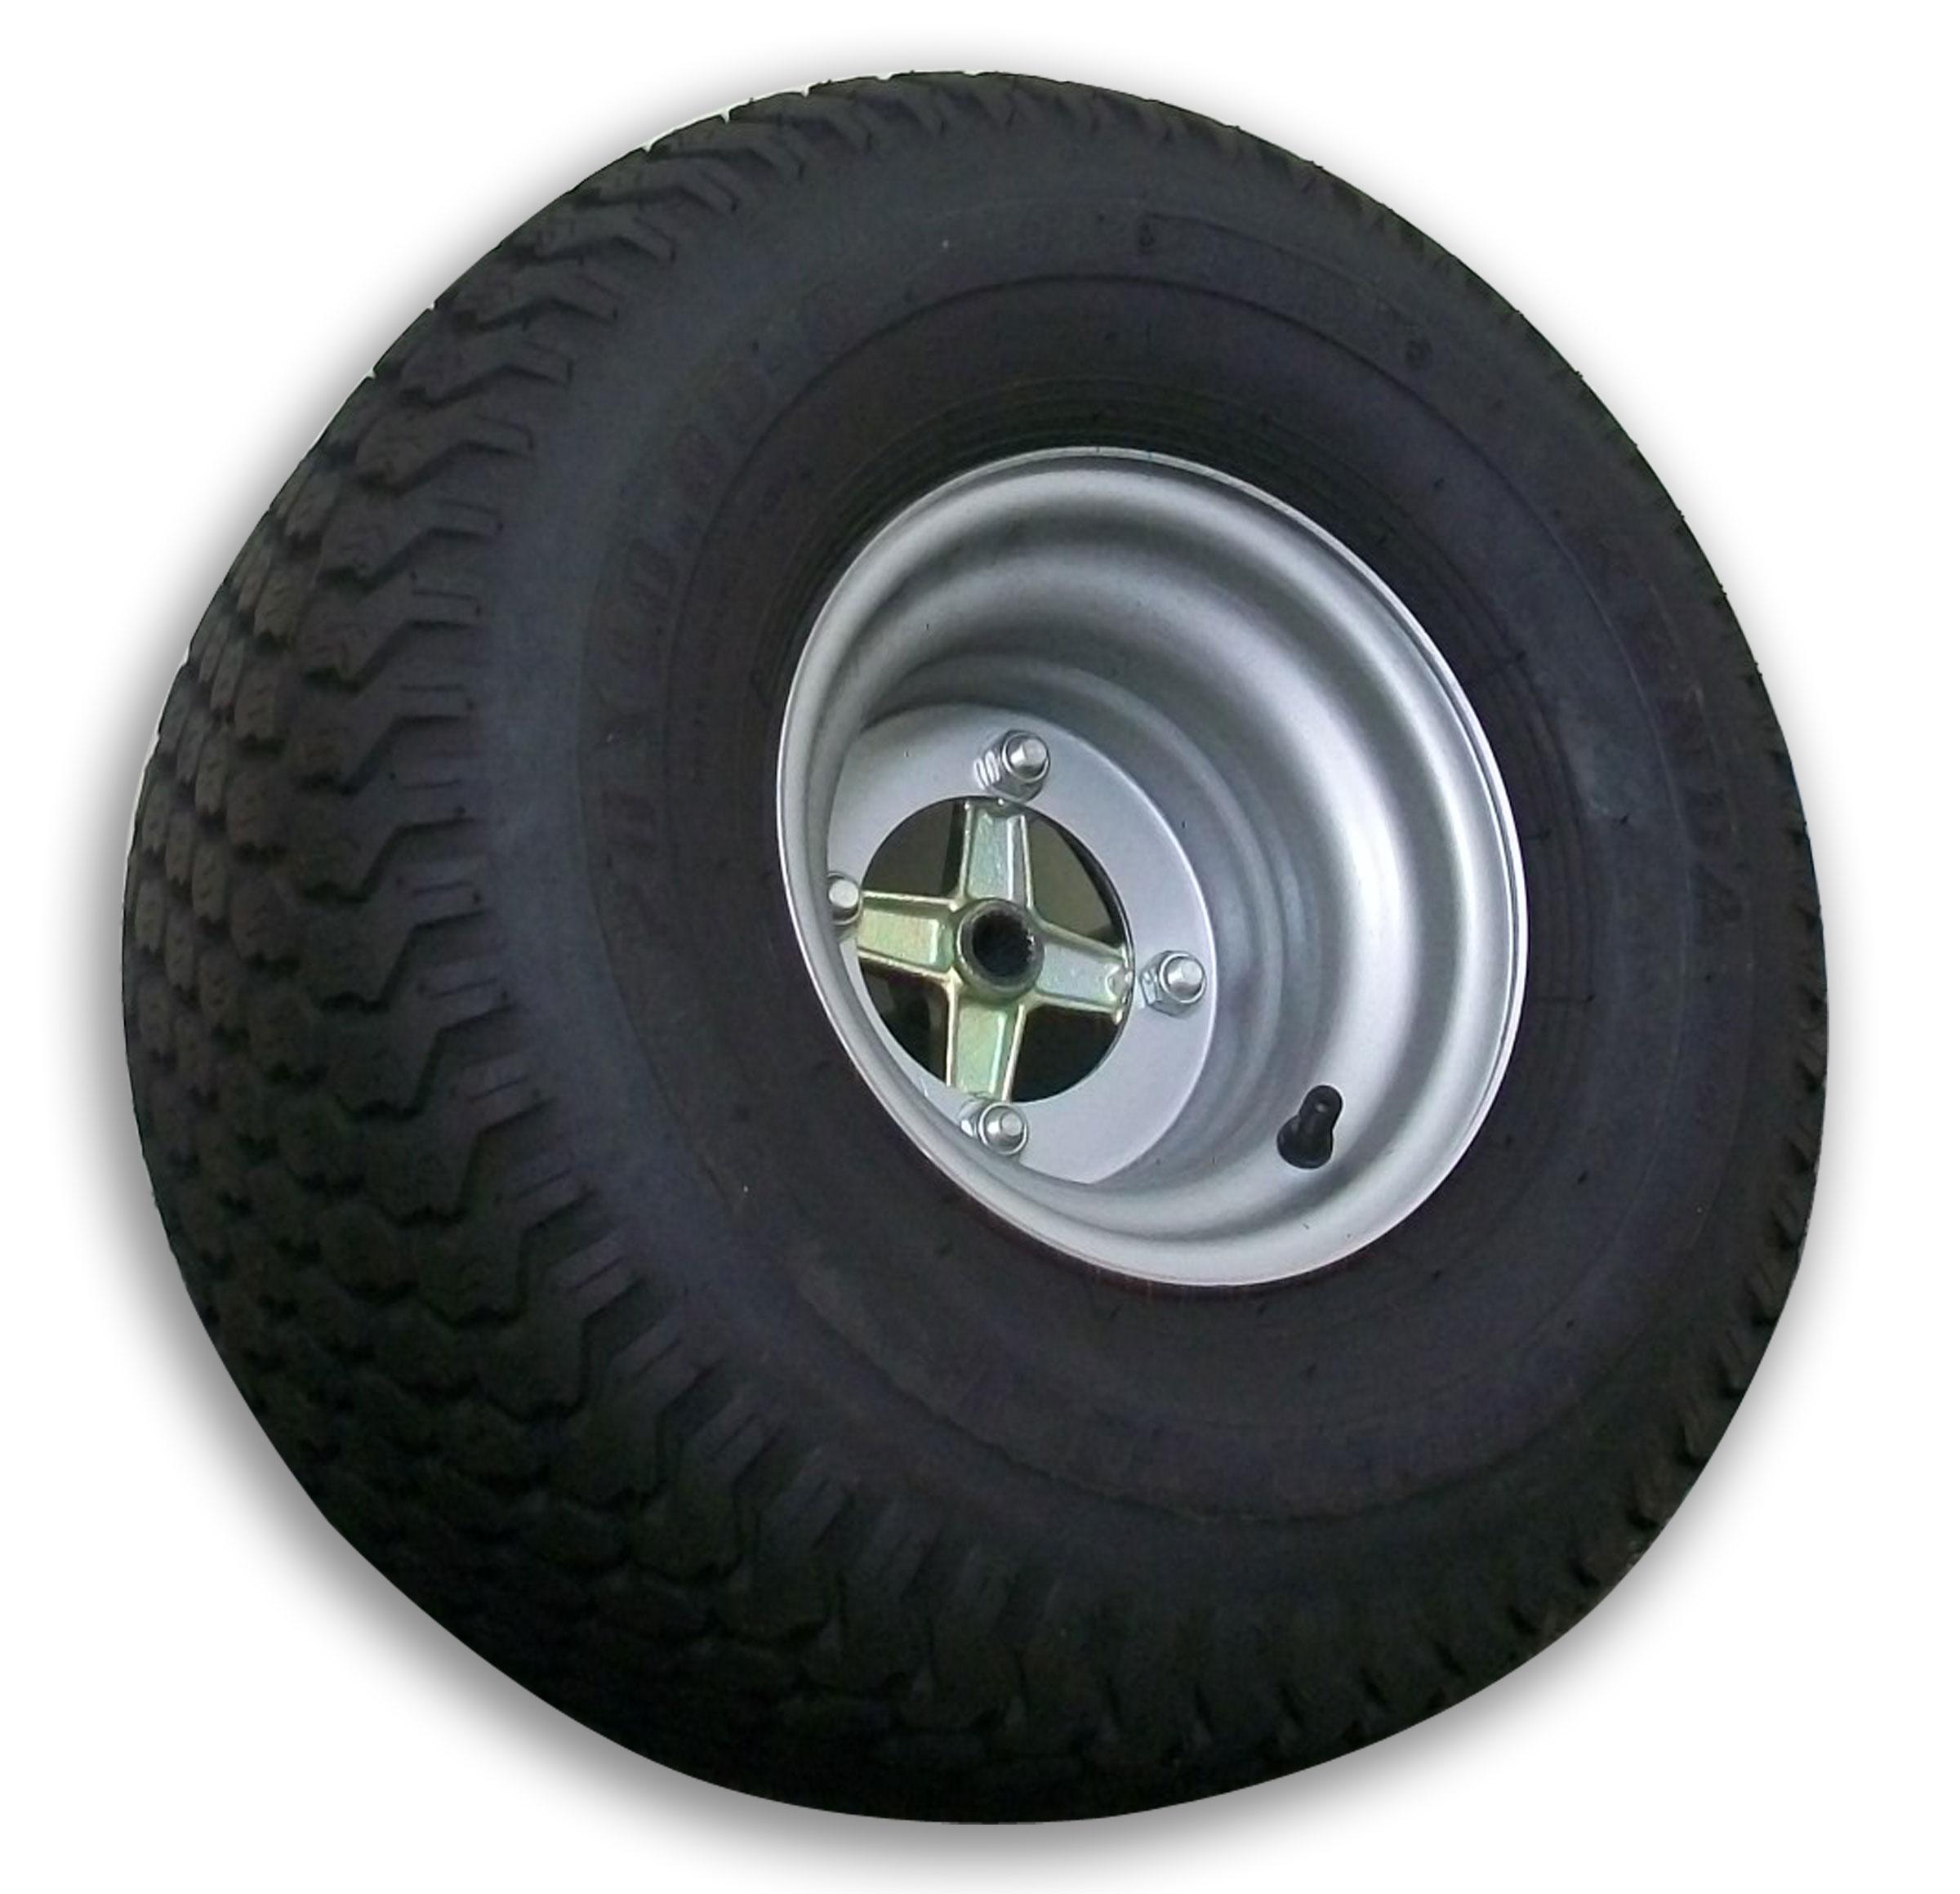 20 X 10 00 8 Superturf Tire With Rim Wheel Hub Metric Used